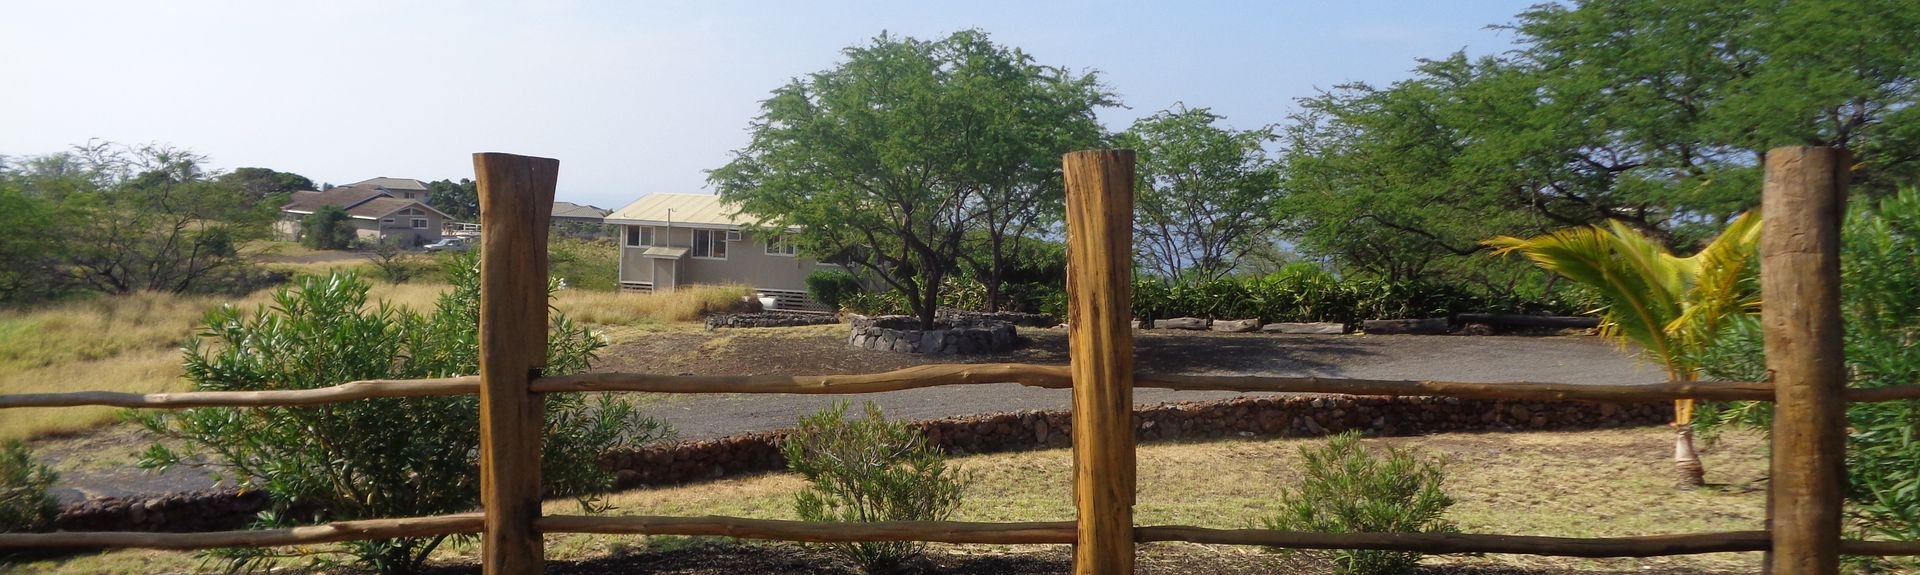 Kohala Estates, Island of Hawai'i, HI, USA